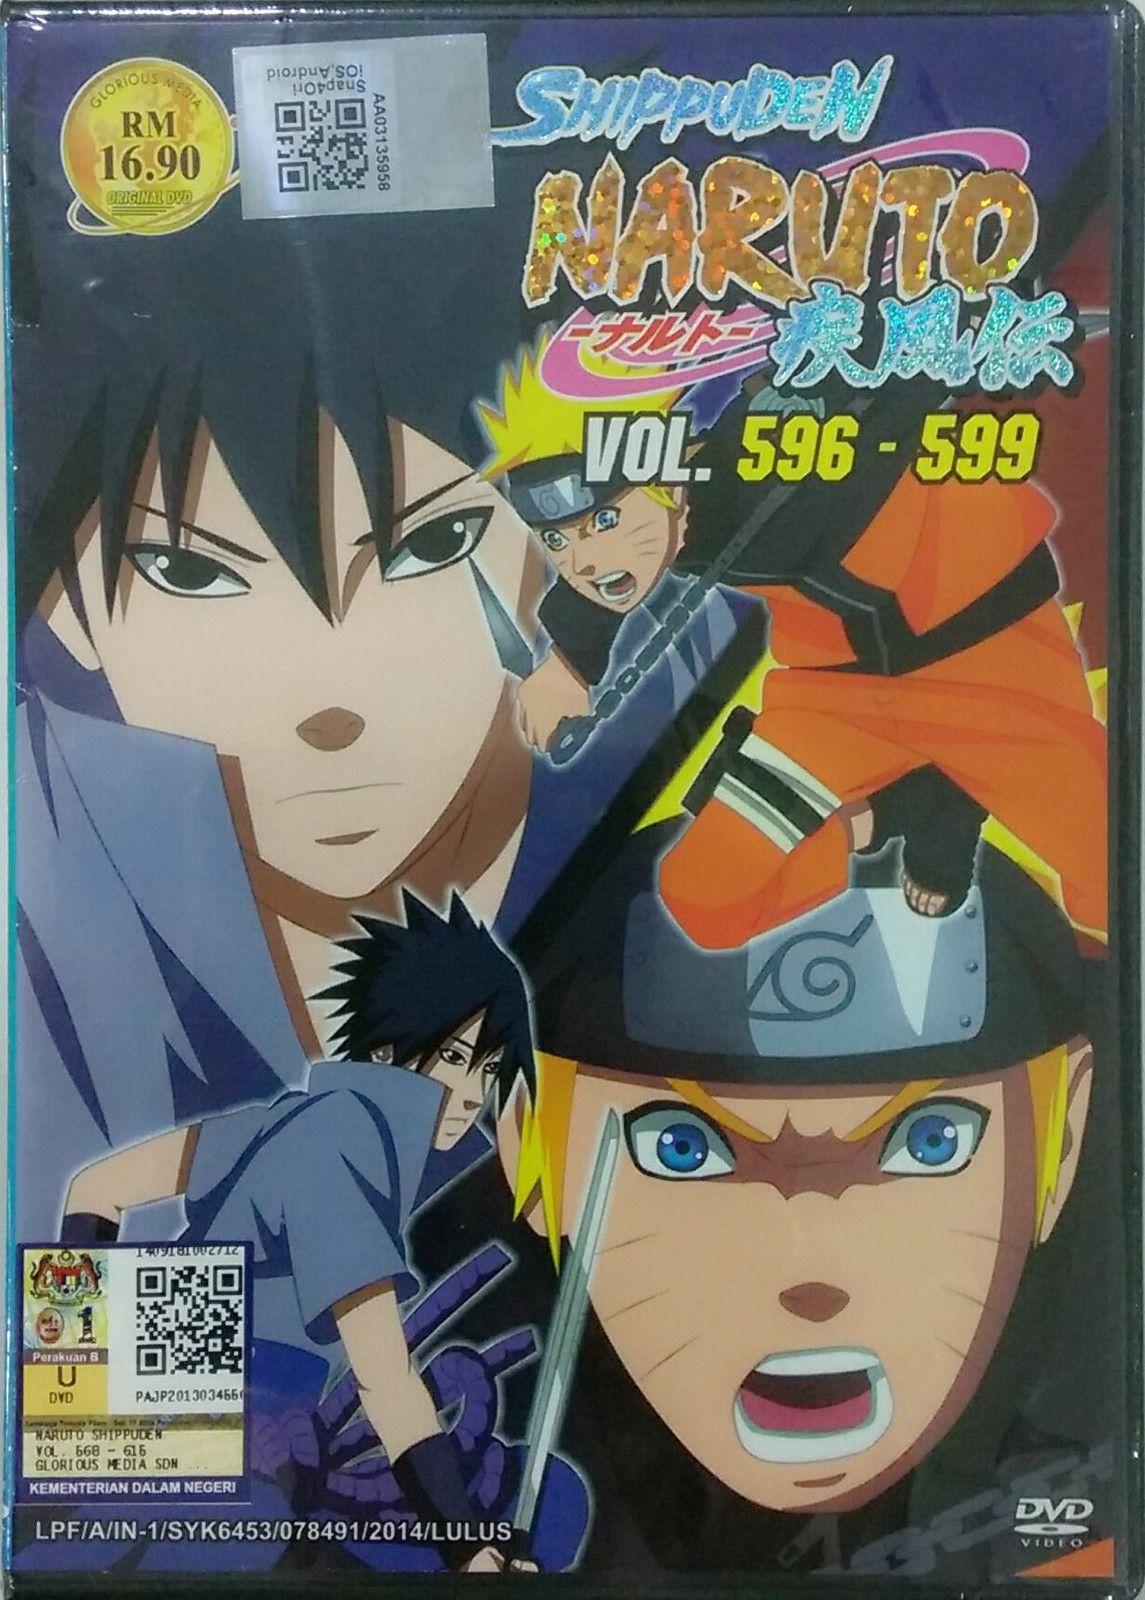 Dvd anime naruto shippuden vol596599 region all english